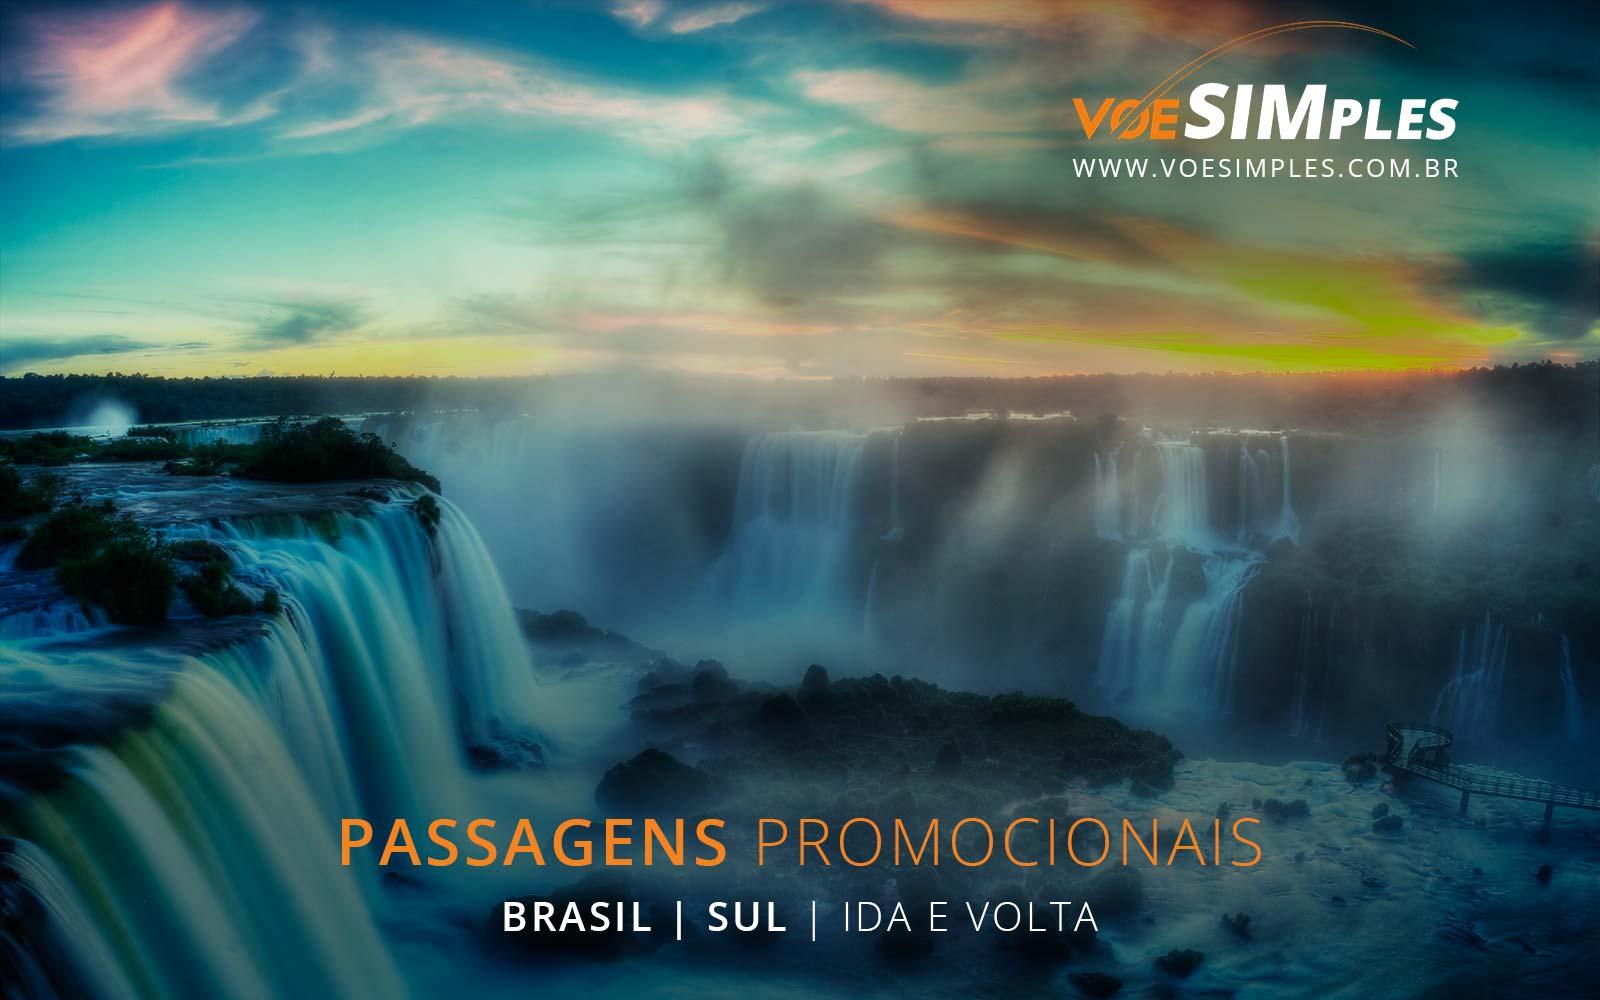 passagens-aereas-promocionais-brasil-voe-simples-passagem-aerea-promocional-barata-promocao-passagens-aviao-passagens-aereas-brasil-sul-ida-volta